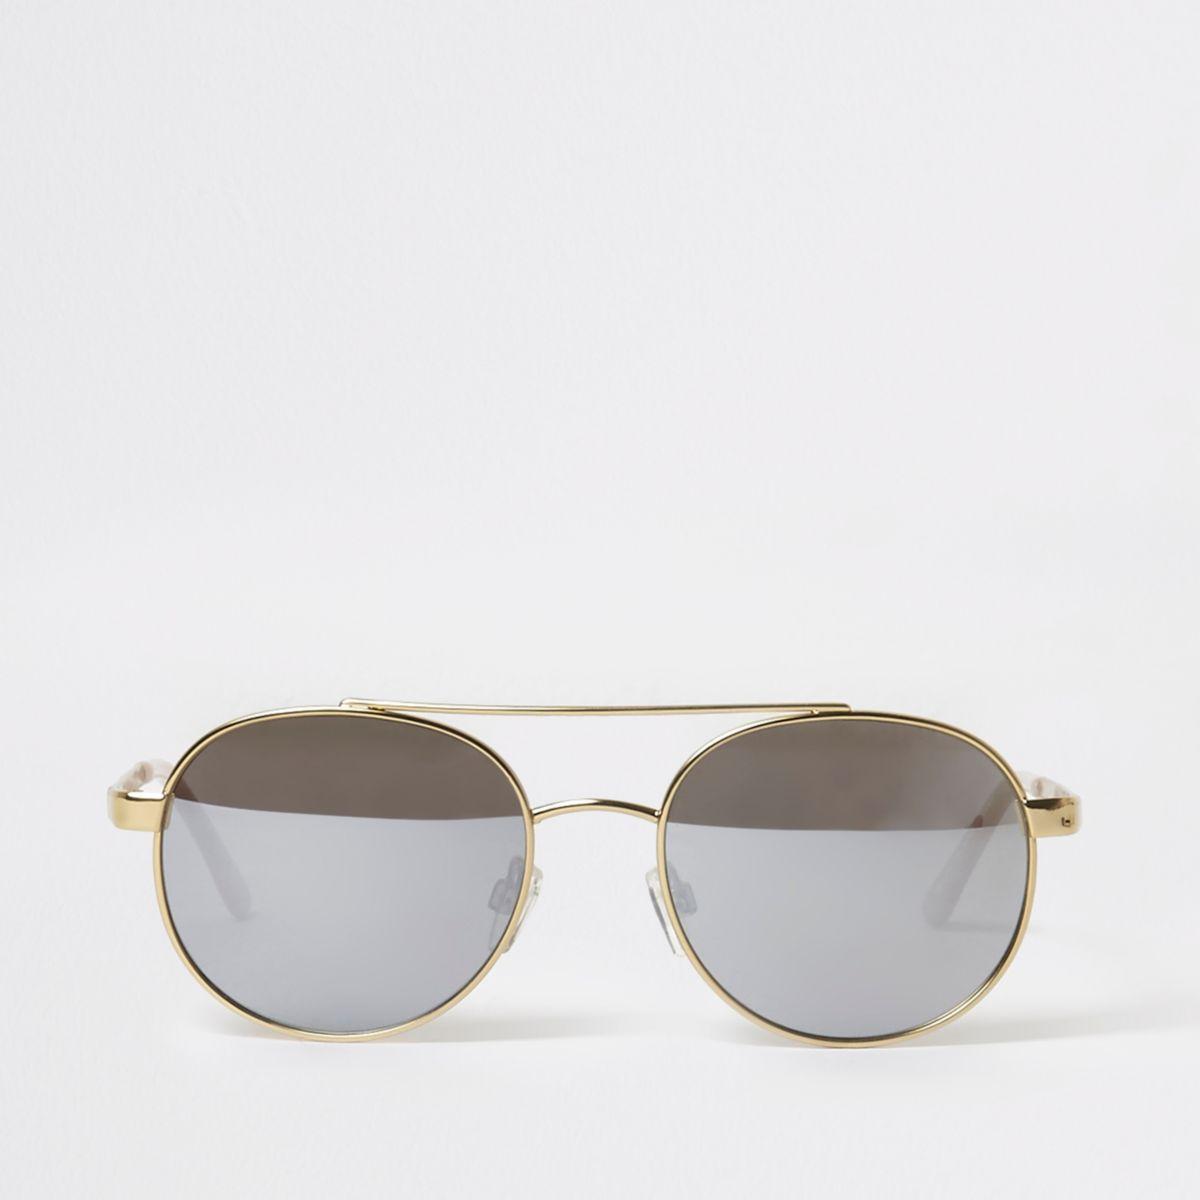 Gold tone round frame aviator sunglasses